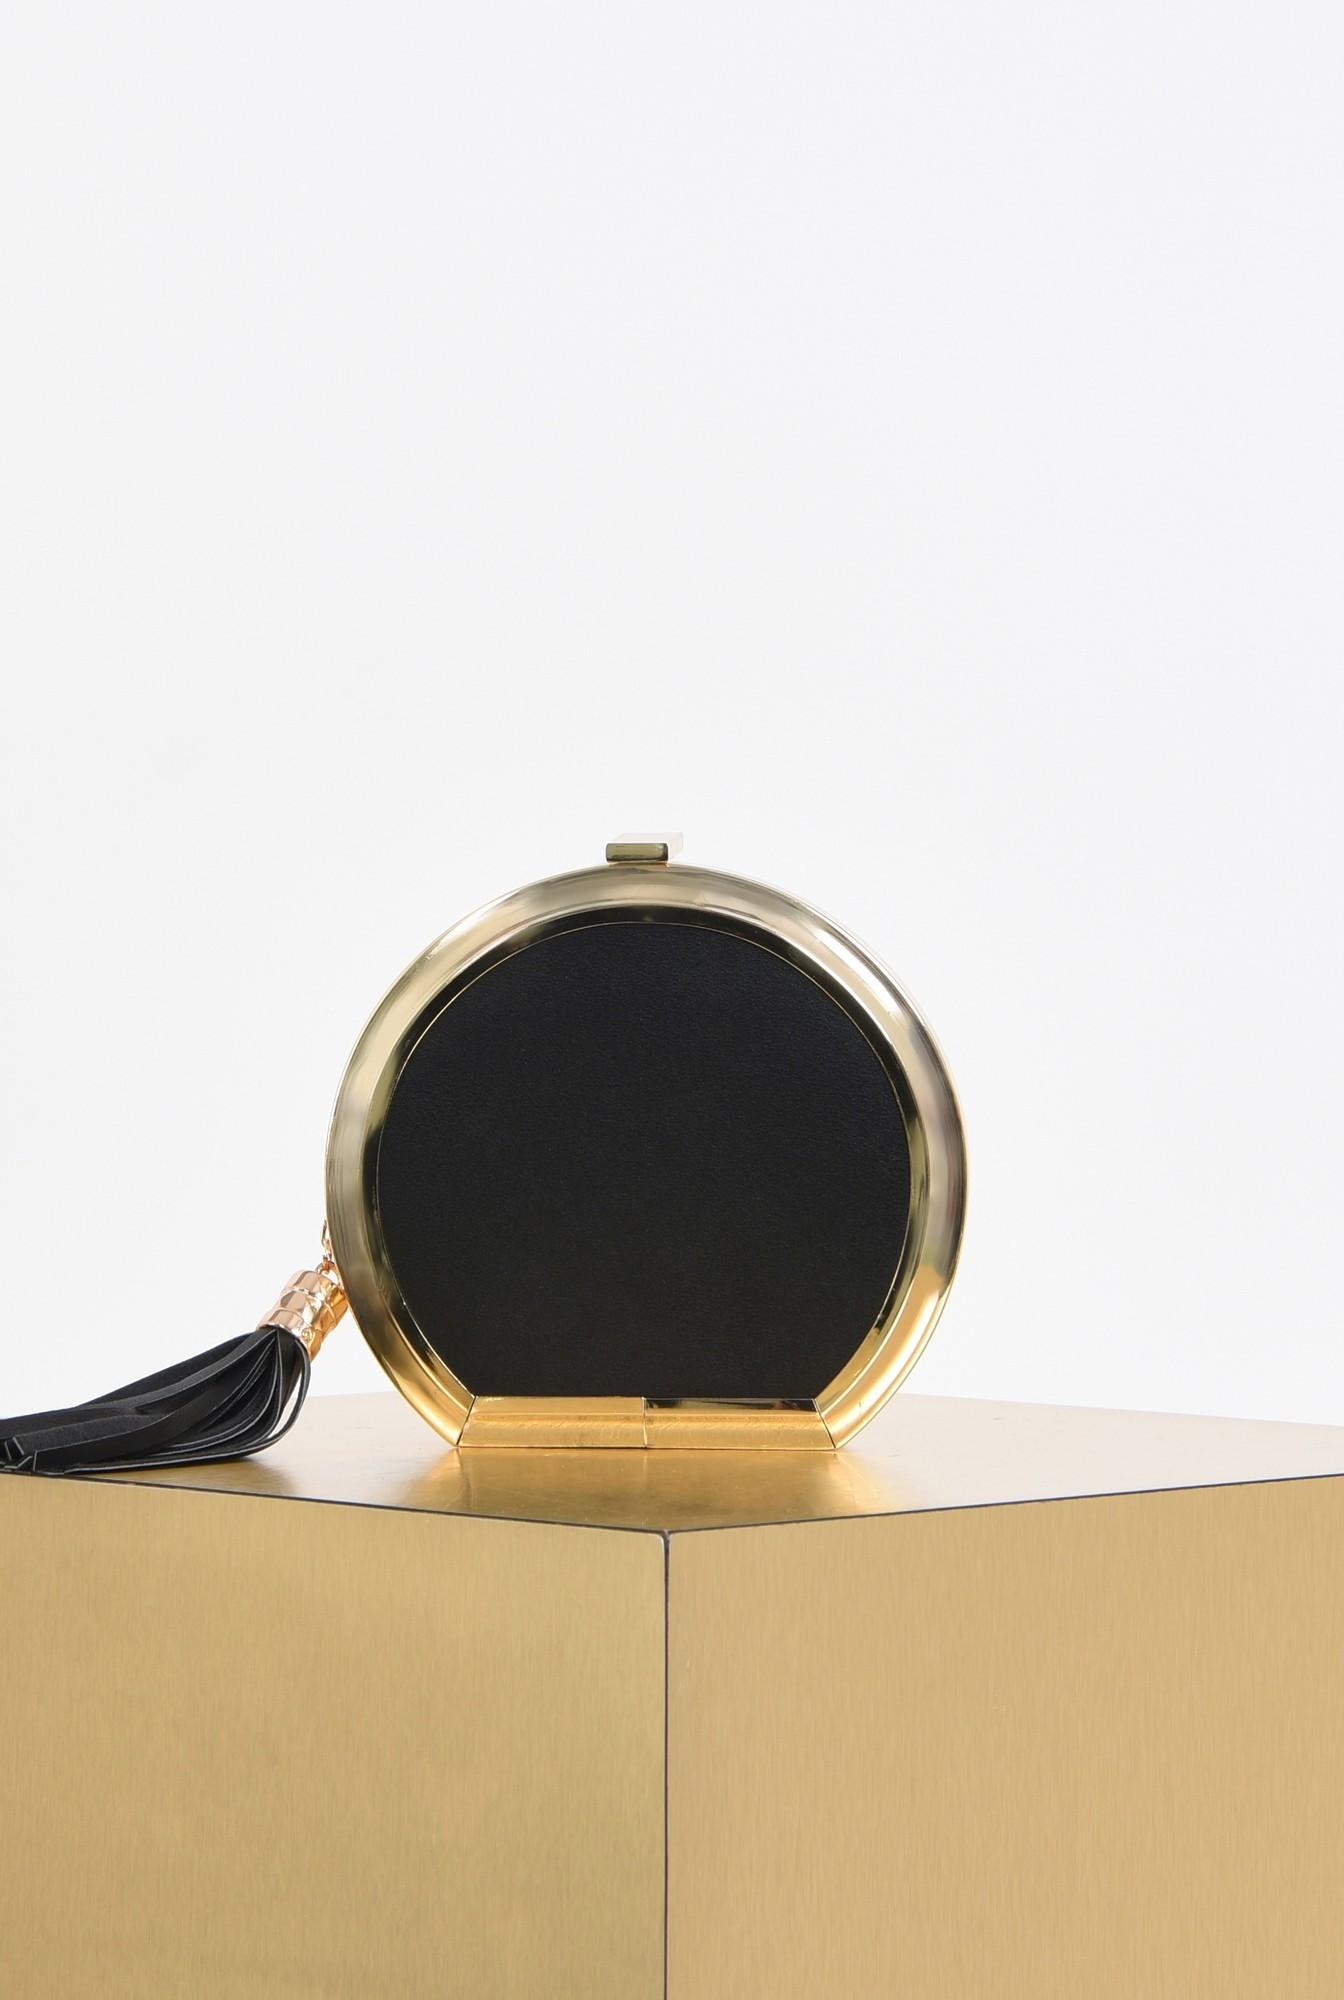 plic elegant, negru, caseta, ciucure, lant auriu